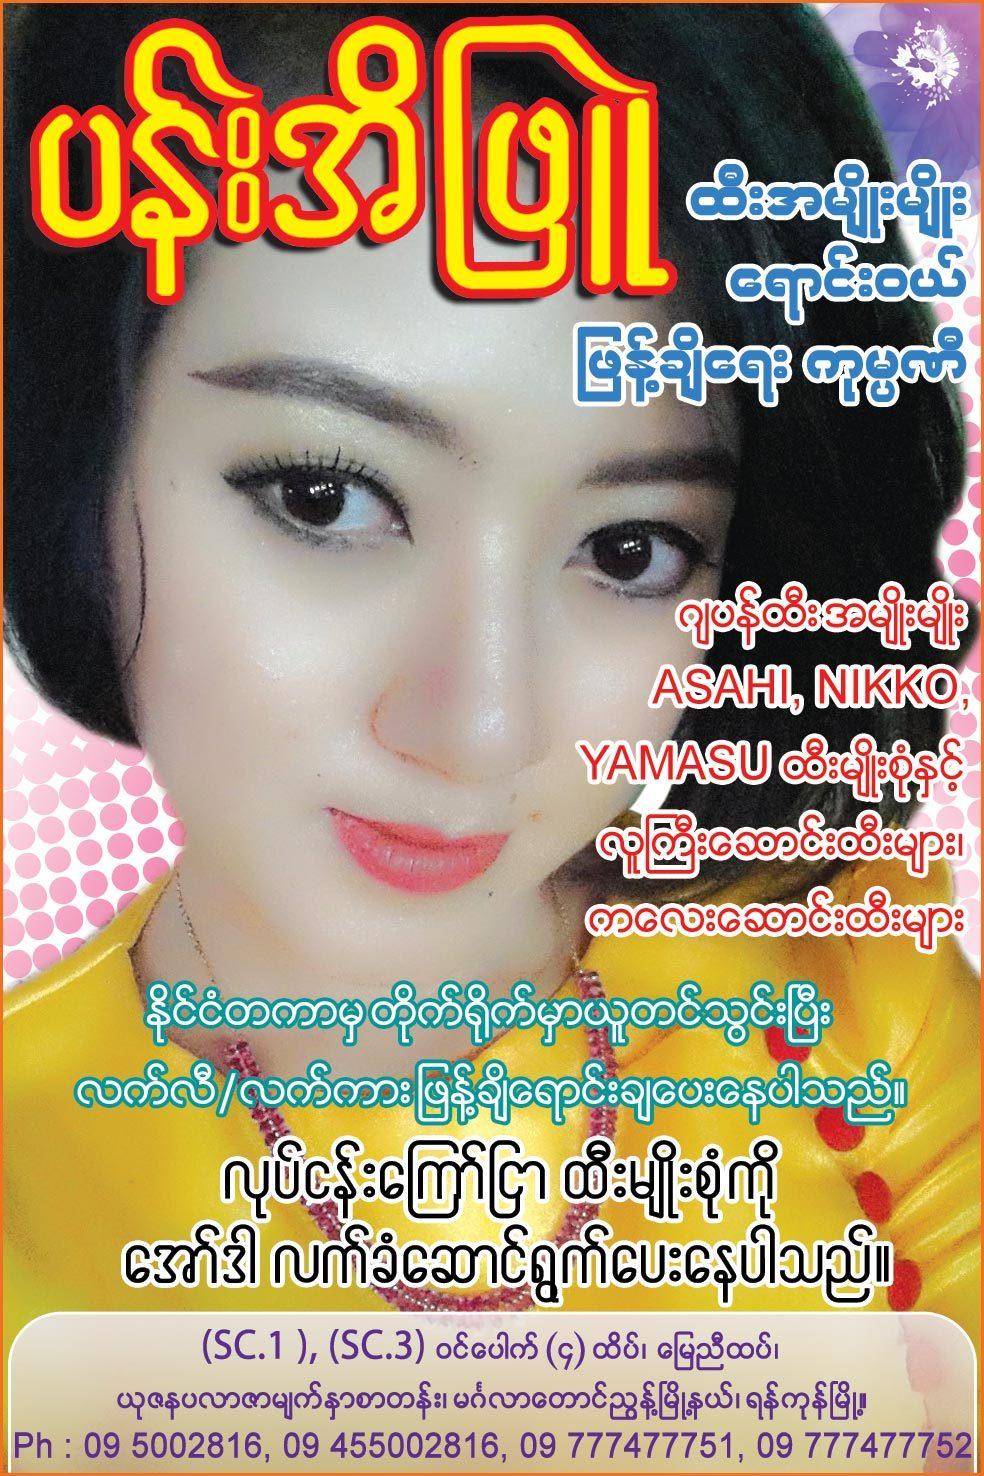 Pan-Ei-Phyu_Umbrella_626.jpg